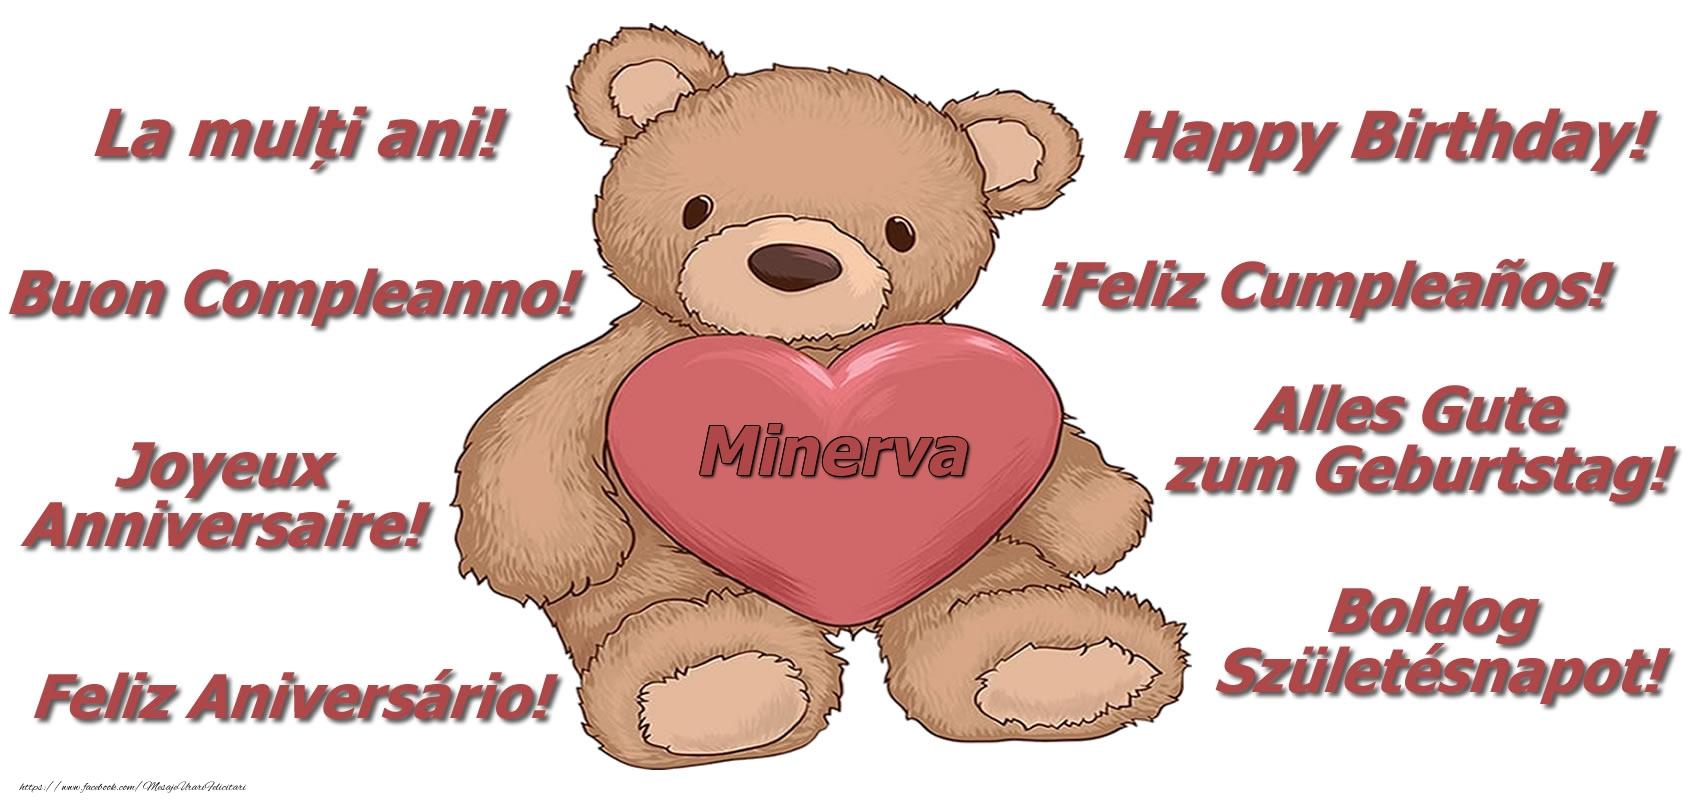 Felicitari de zi de nastere - La multi ani Minerva! - Ursulet